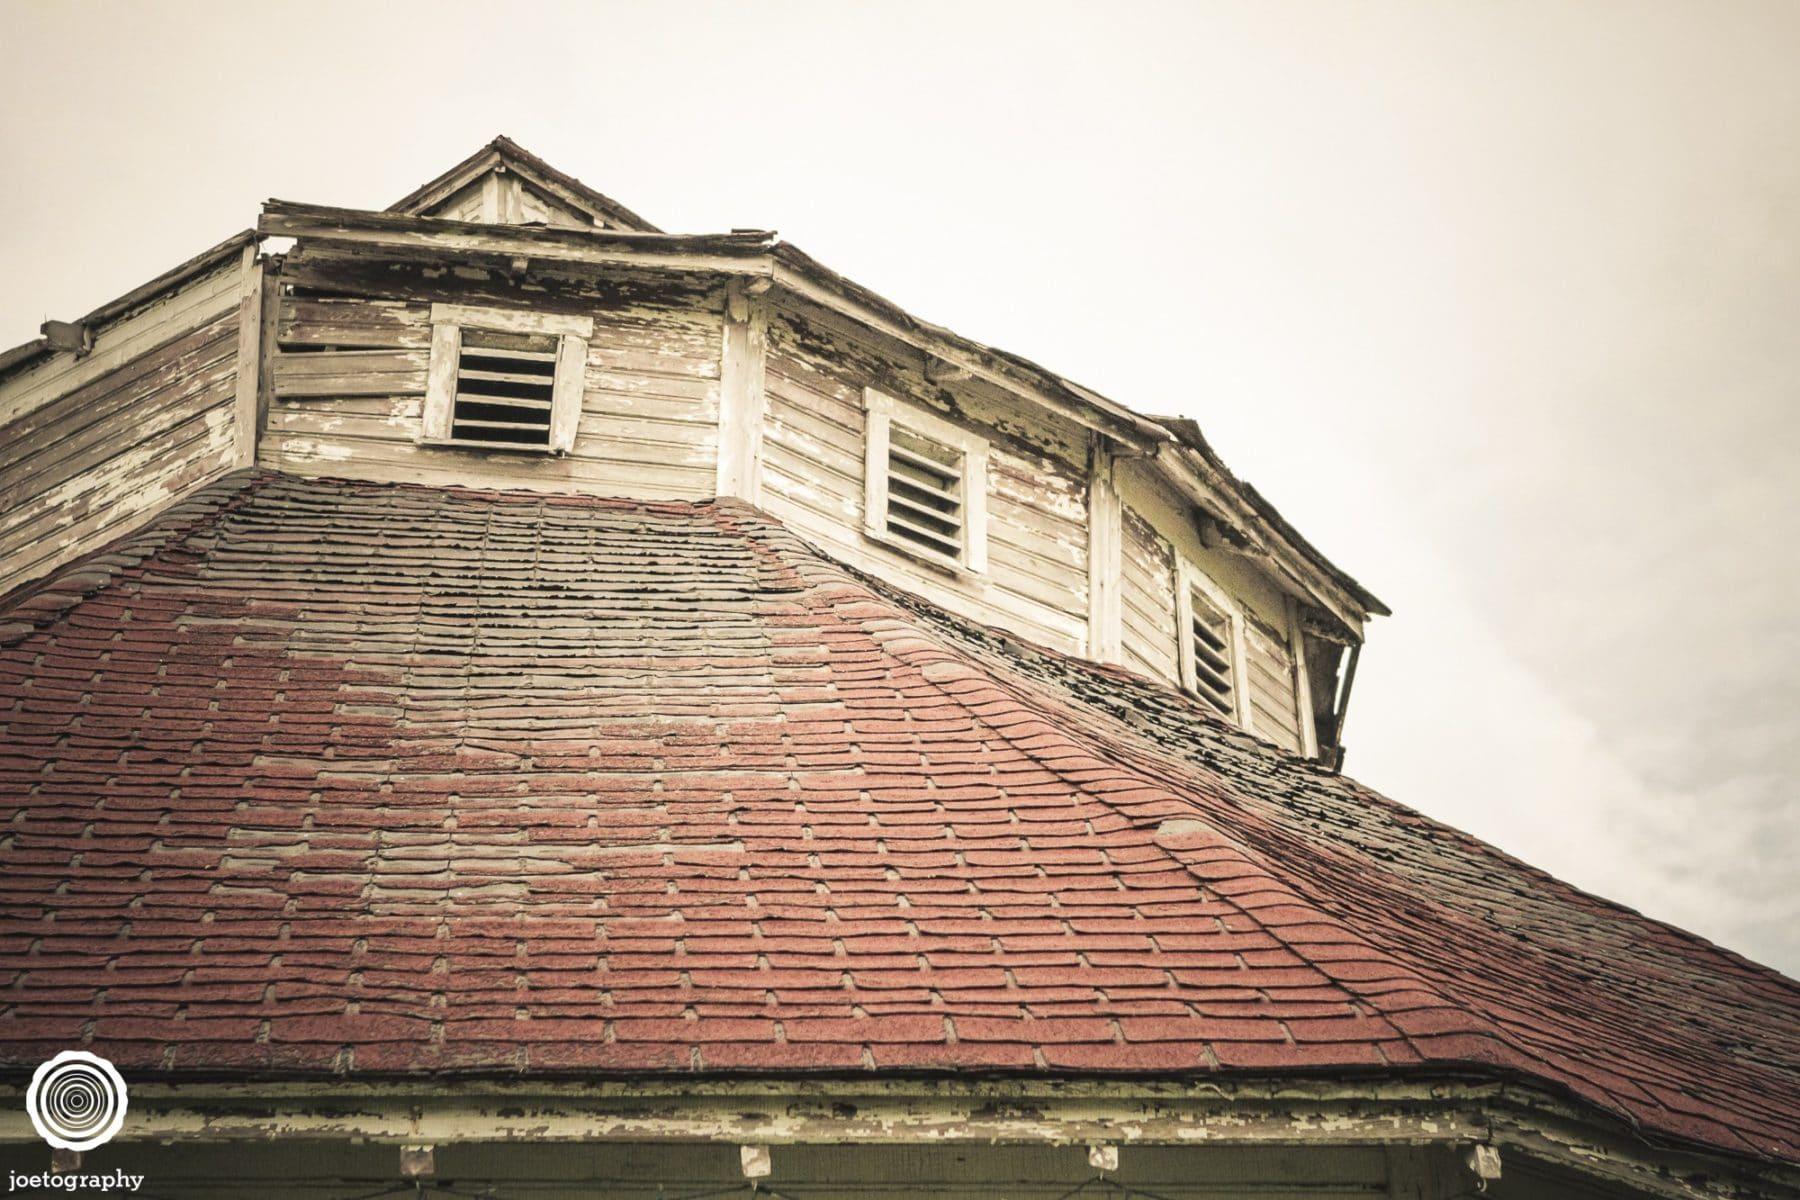 polygonal-barn-architecture-photos-shelbyville-indiana-23